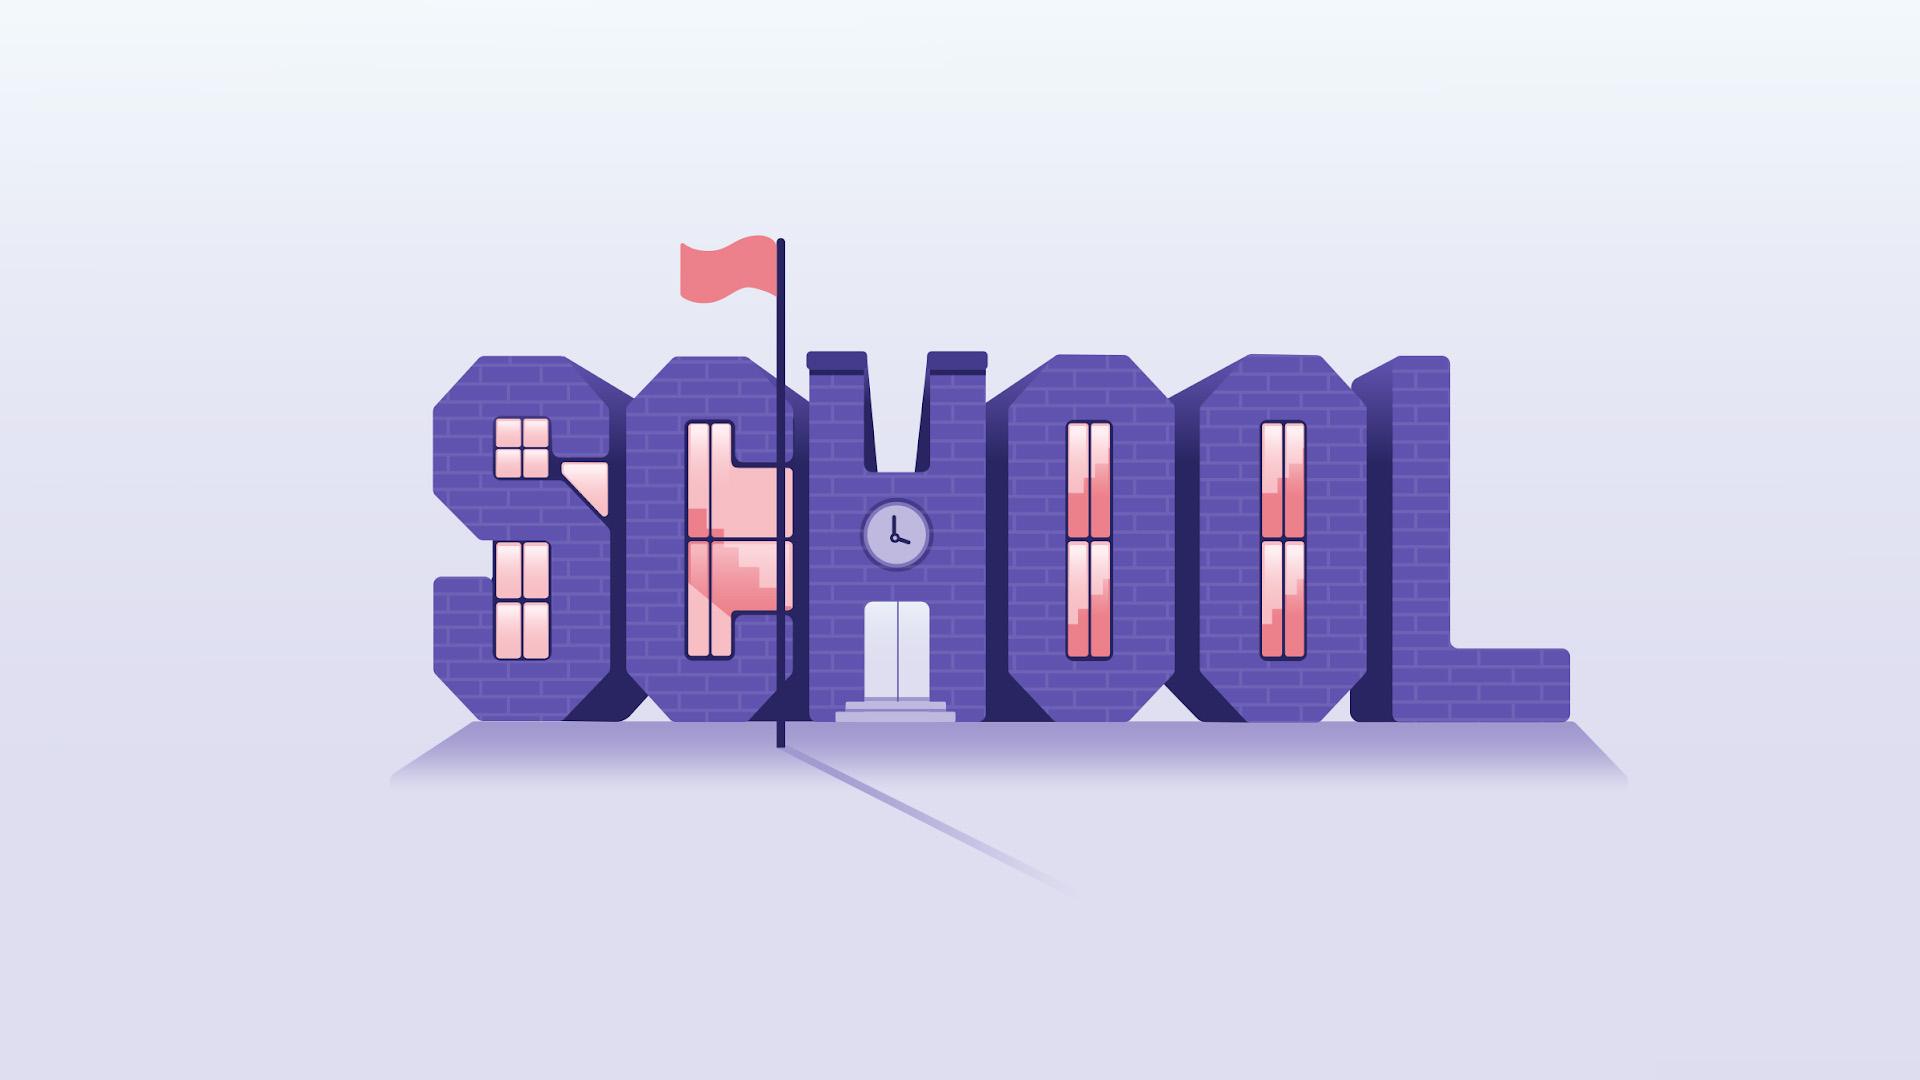 roofstudio_juni-learning_school-02-6